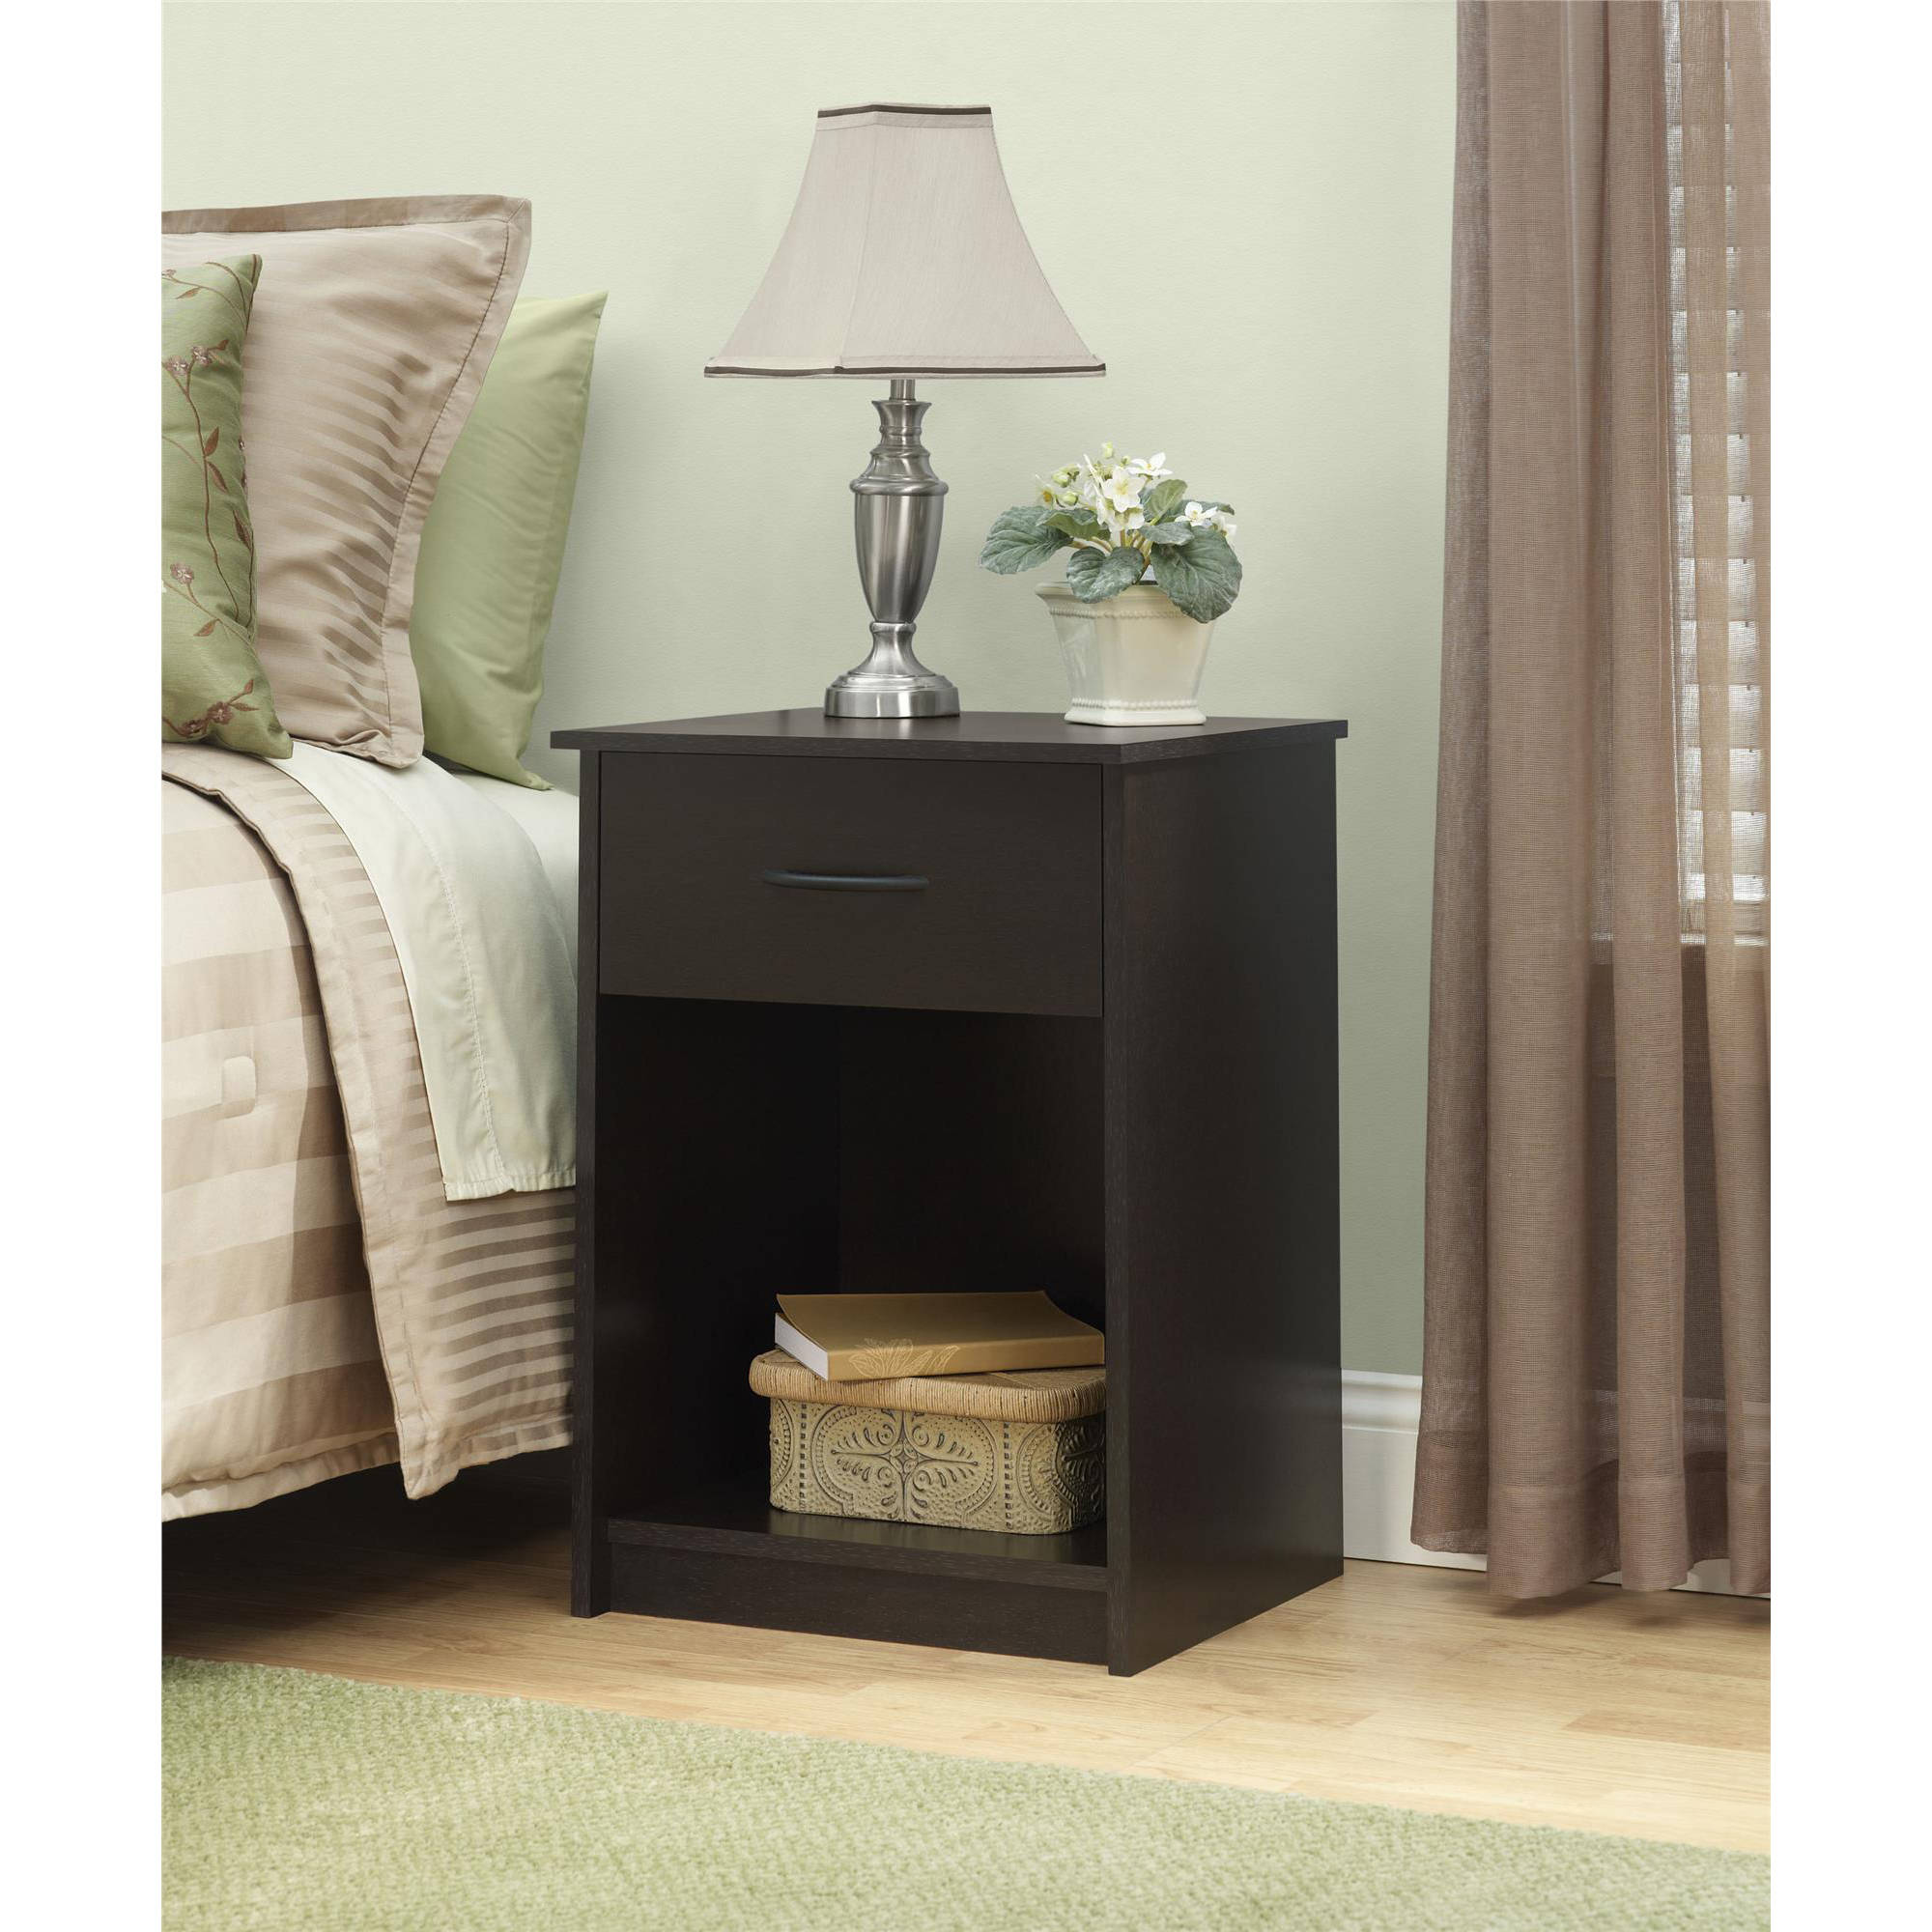 Nightstand Night Stand End Table 1 Drawer Furniture Bedroom Bedside Wood Brown  eBay